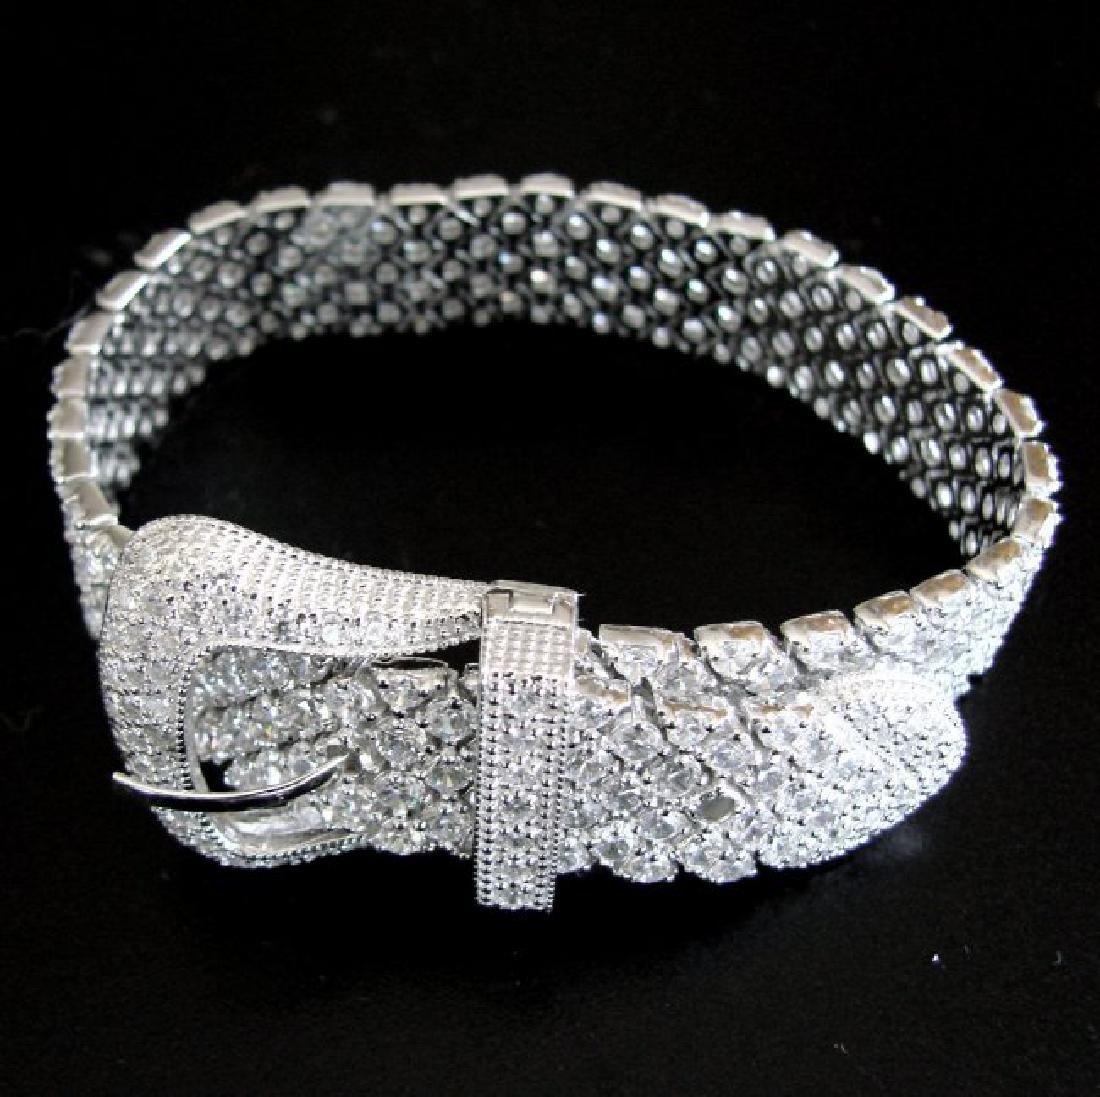 Bracelet Creation Diamond 47.91Ct 18k W/g Overlay - 5